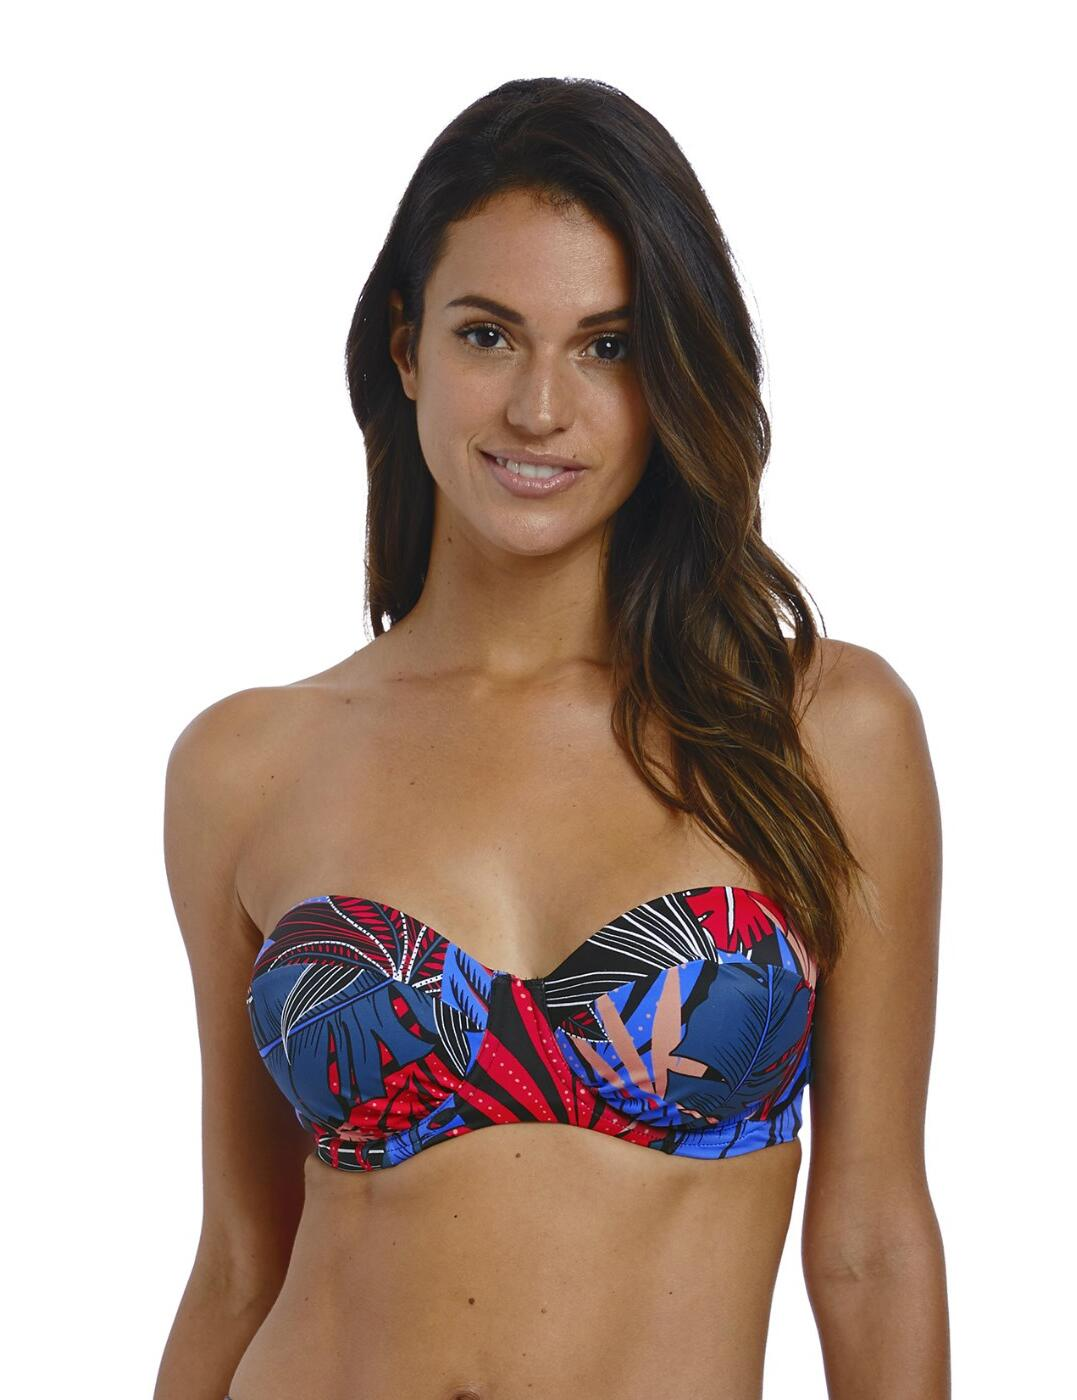 6622 Fantasie Monte Cristi Bandeau Bikini Top - 6622 Multi